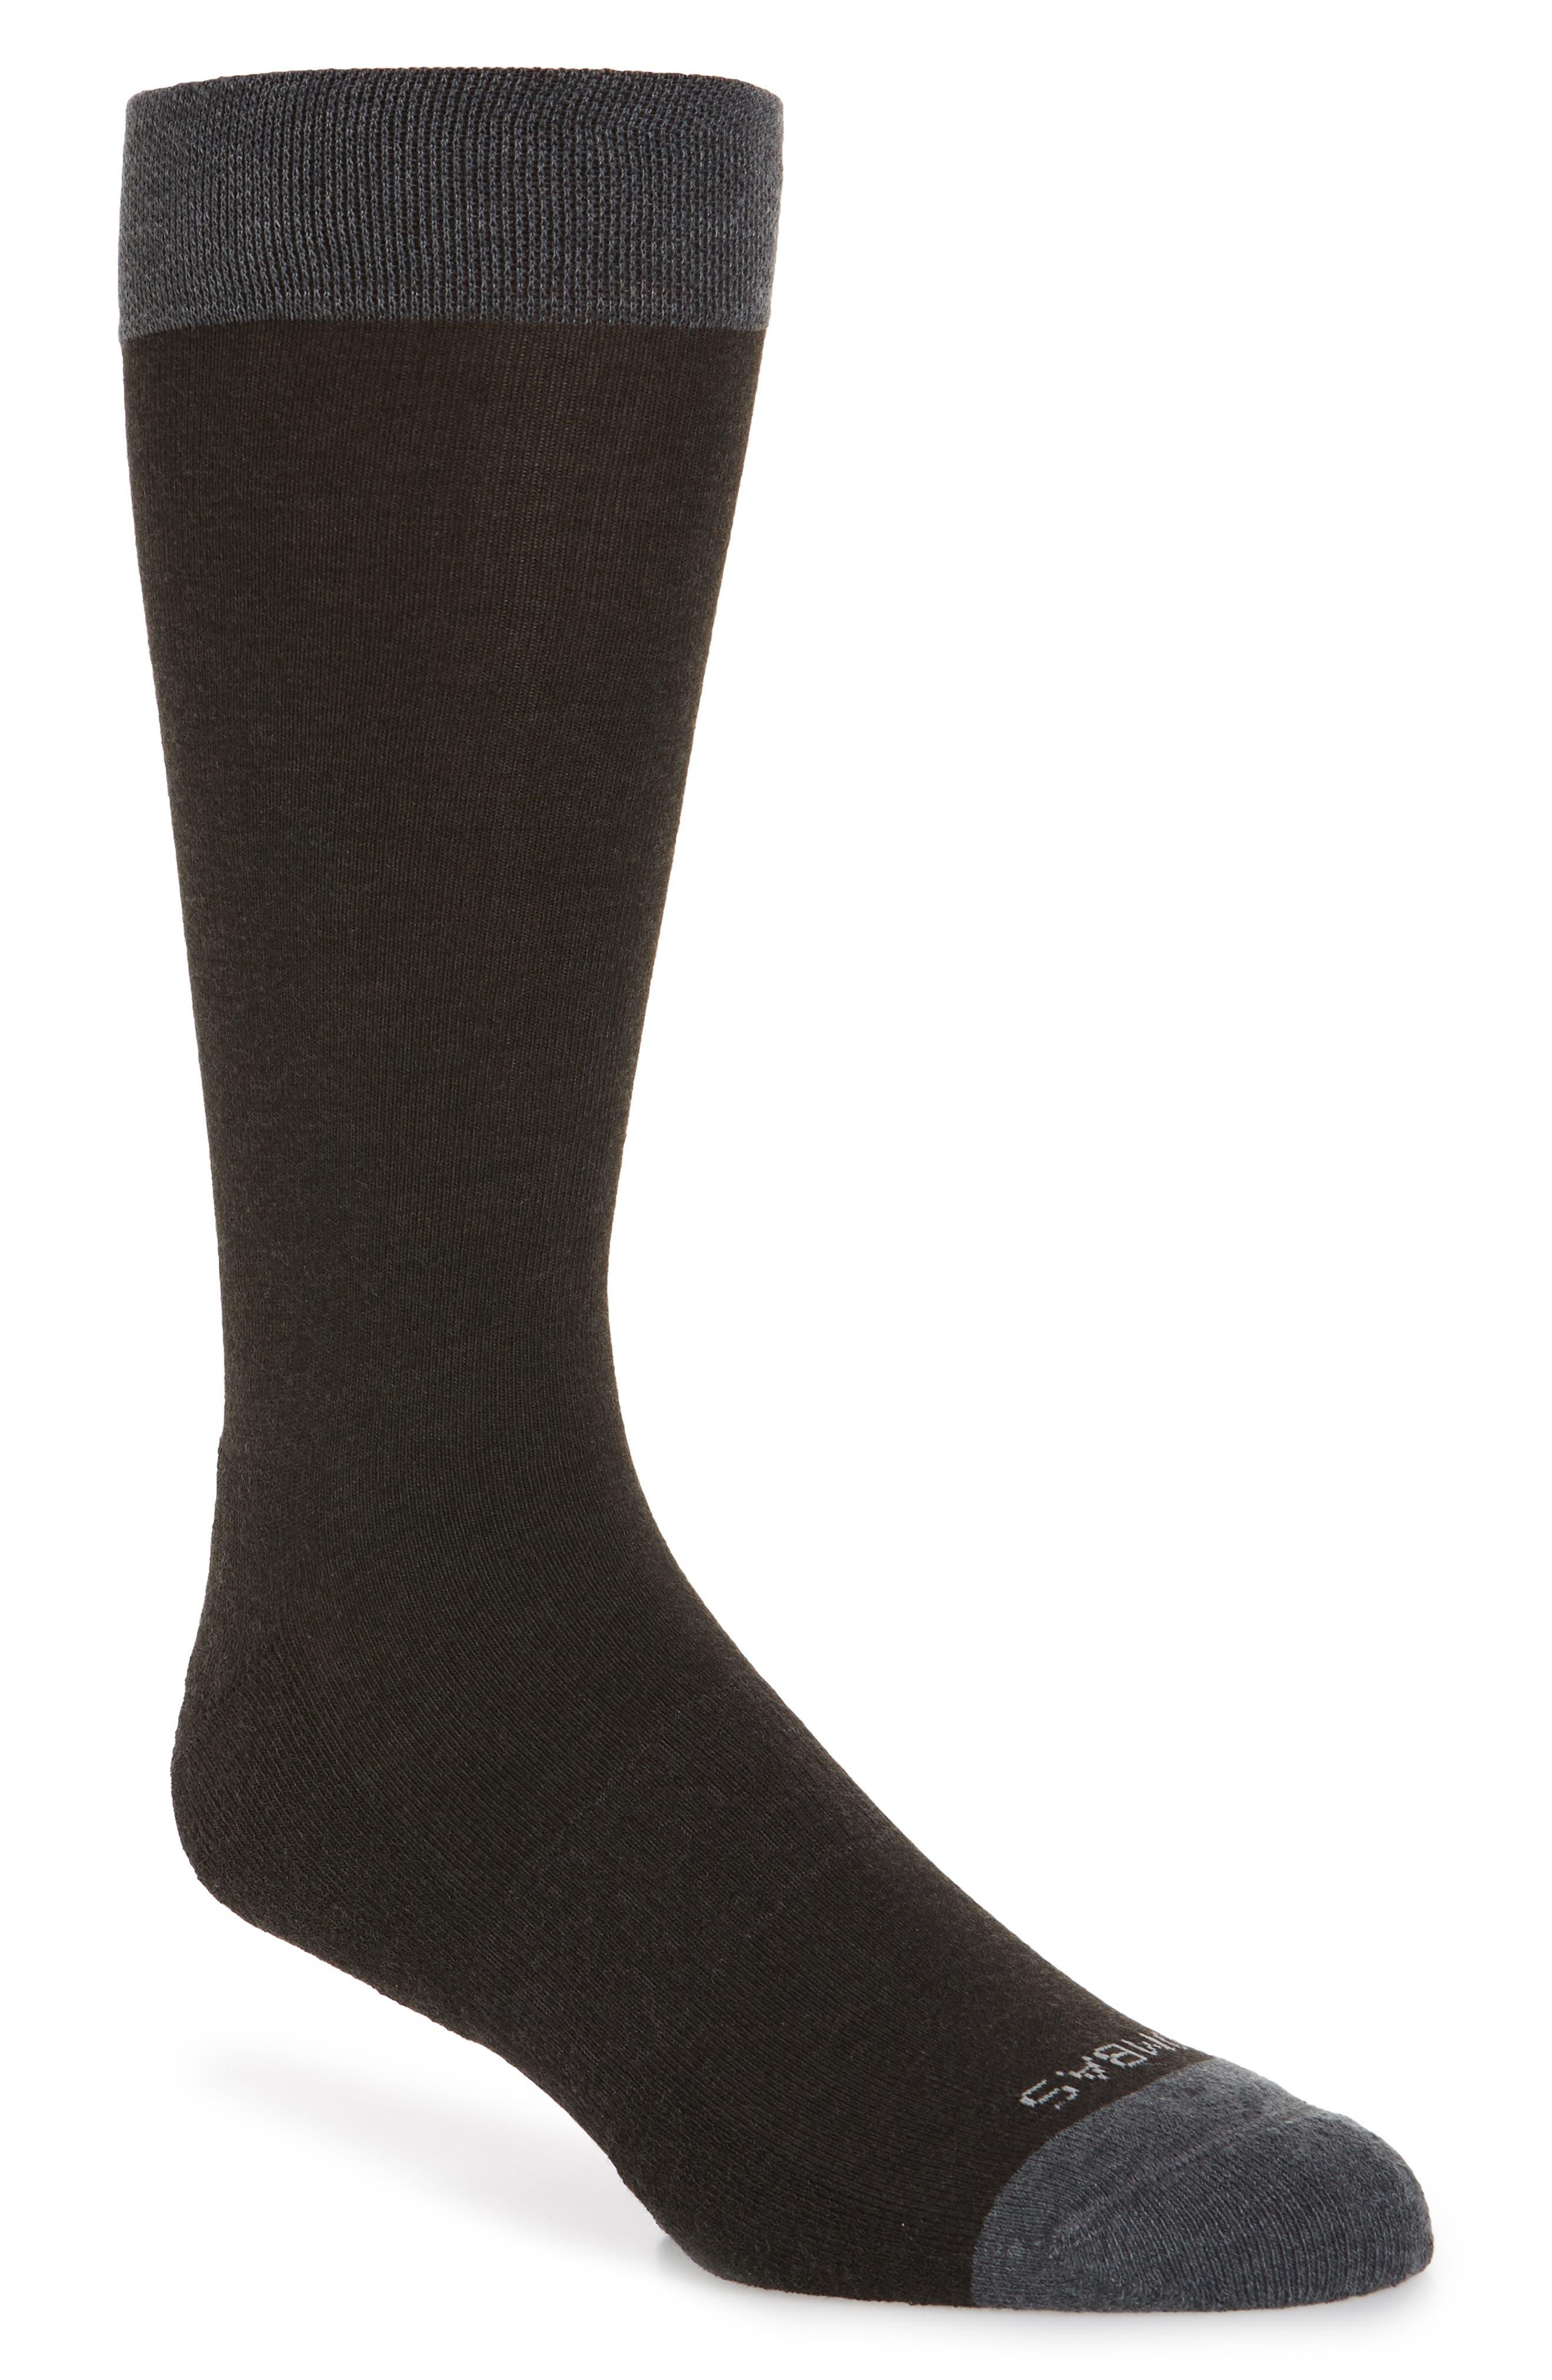 Solid Dress Socks,                         Main,                         color, CHARCOAL